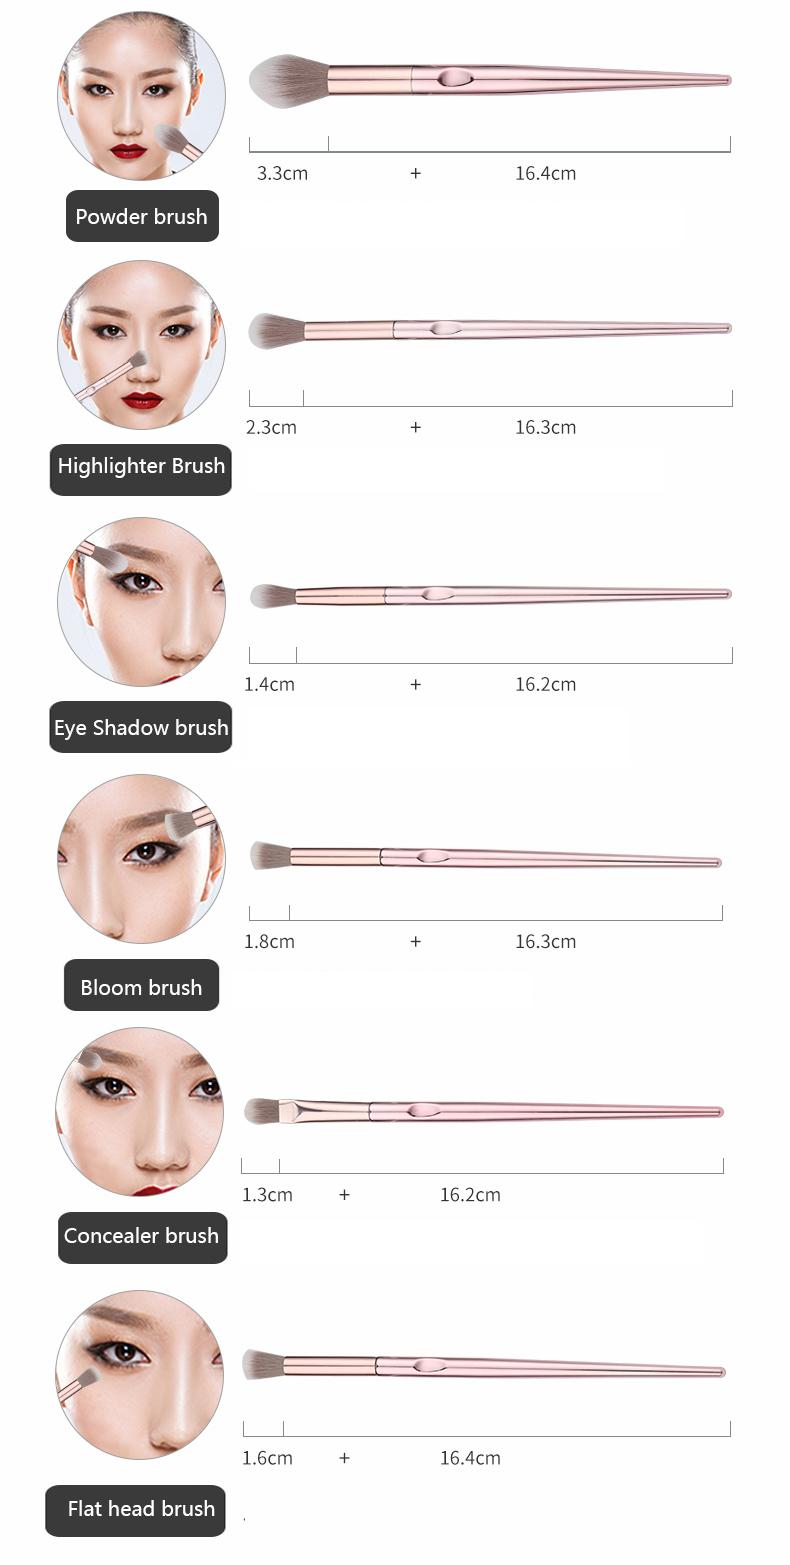 New 10Pcs Eye Makeup Brushes Set Eye Shadow Eyebrow Sculpting Power Brushes Facial Makeup Cosmetic Brush Tools 1